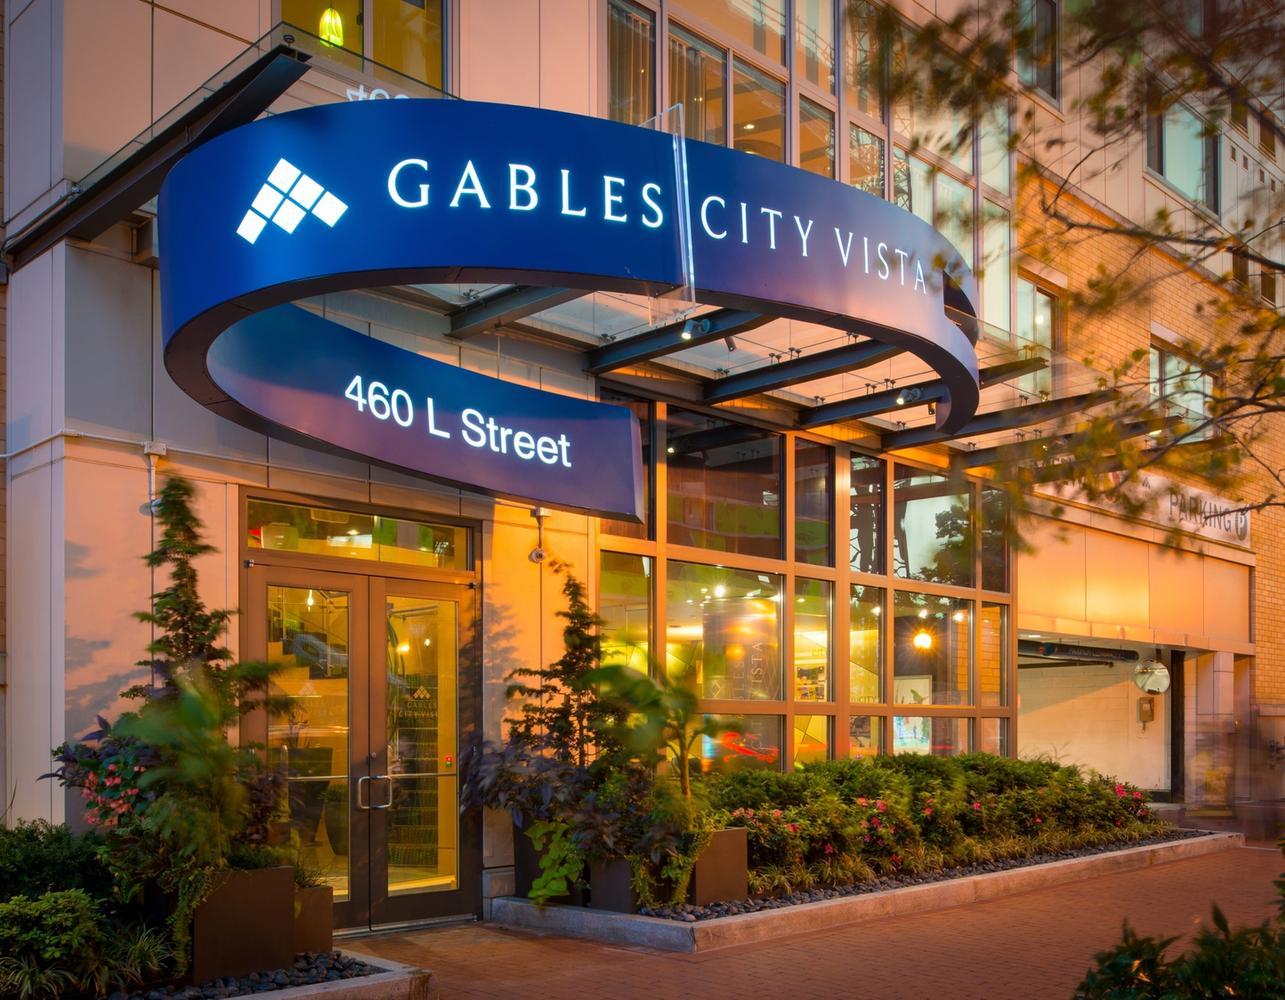 Gables City Vista | Gables Residential Communities